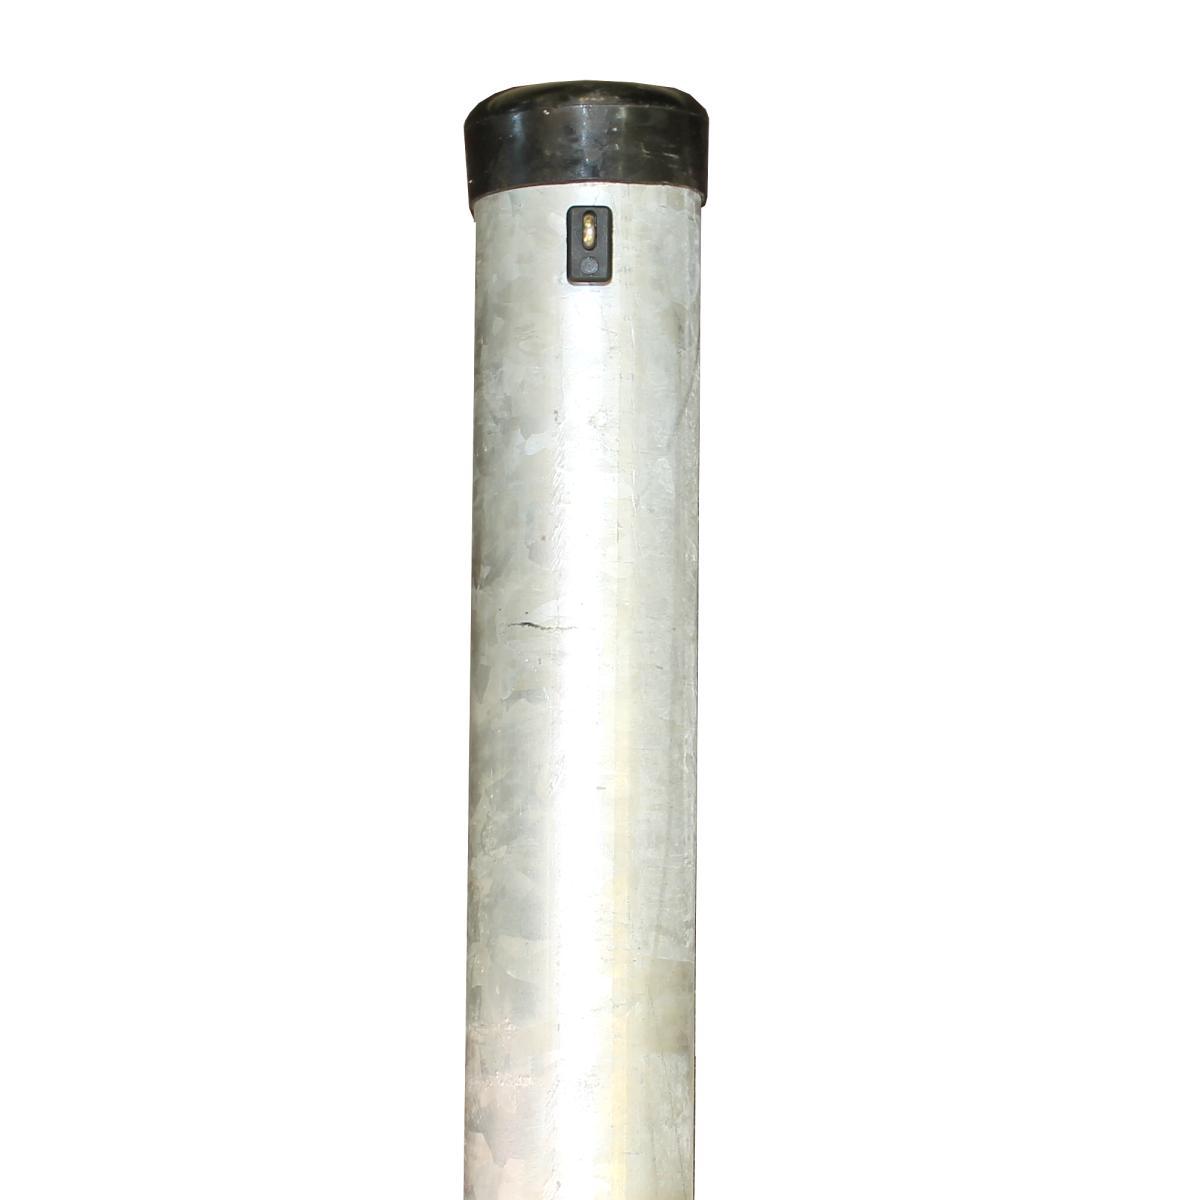 Zaunpfosten Metall Rund NP59 – Hitoiro